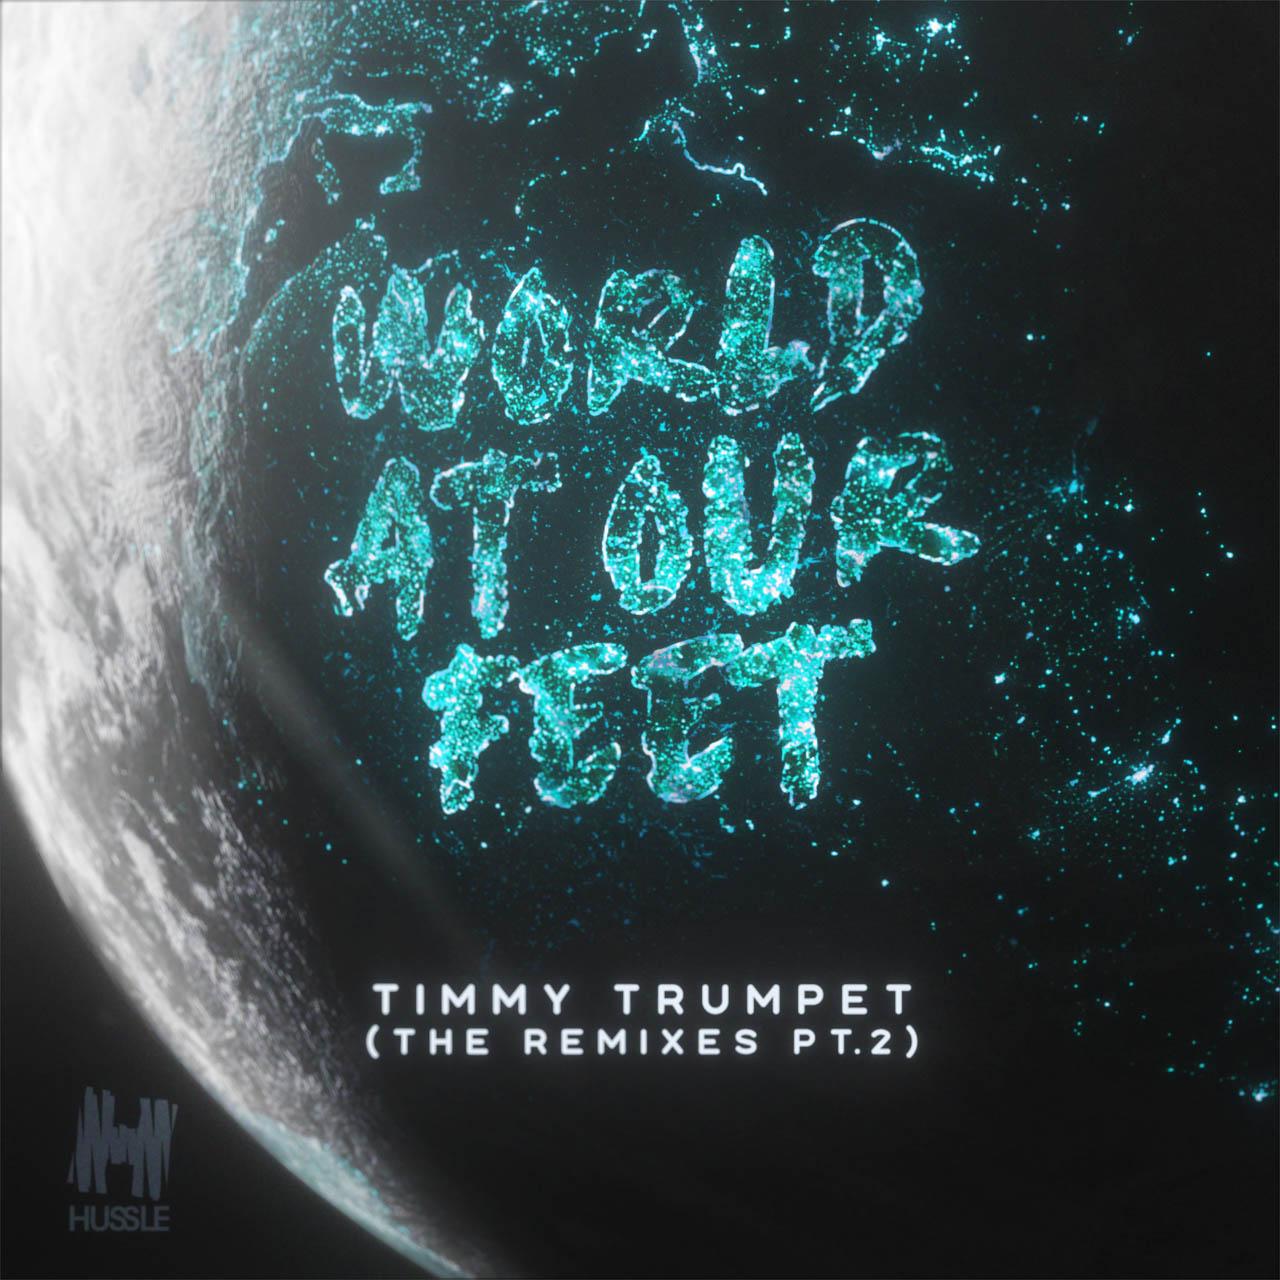 Timmy Trumpet - World At Our Feet (Remixes Pt. 2)